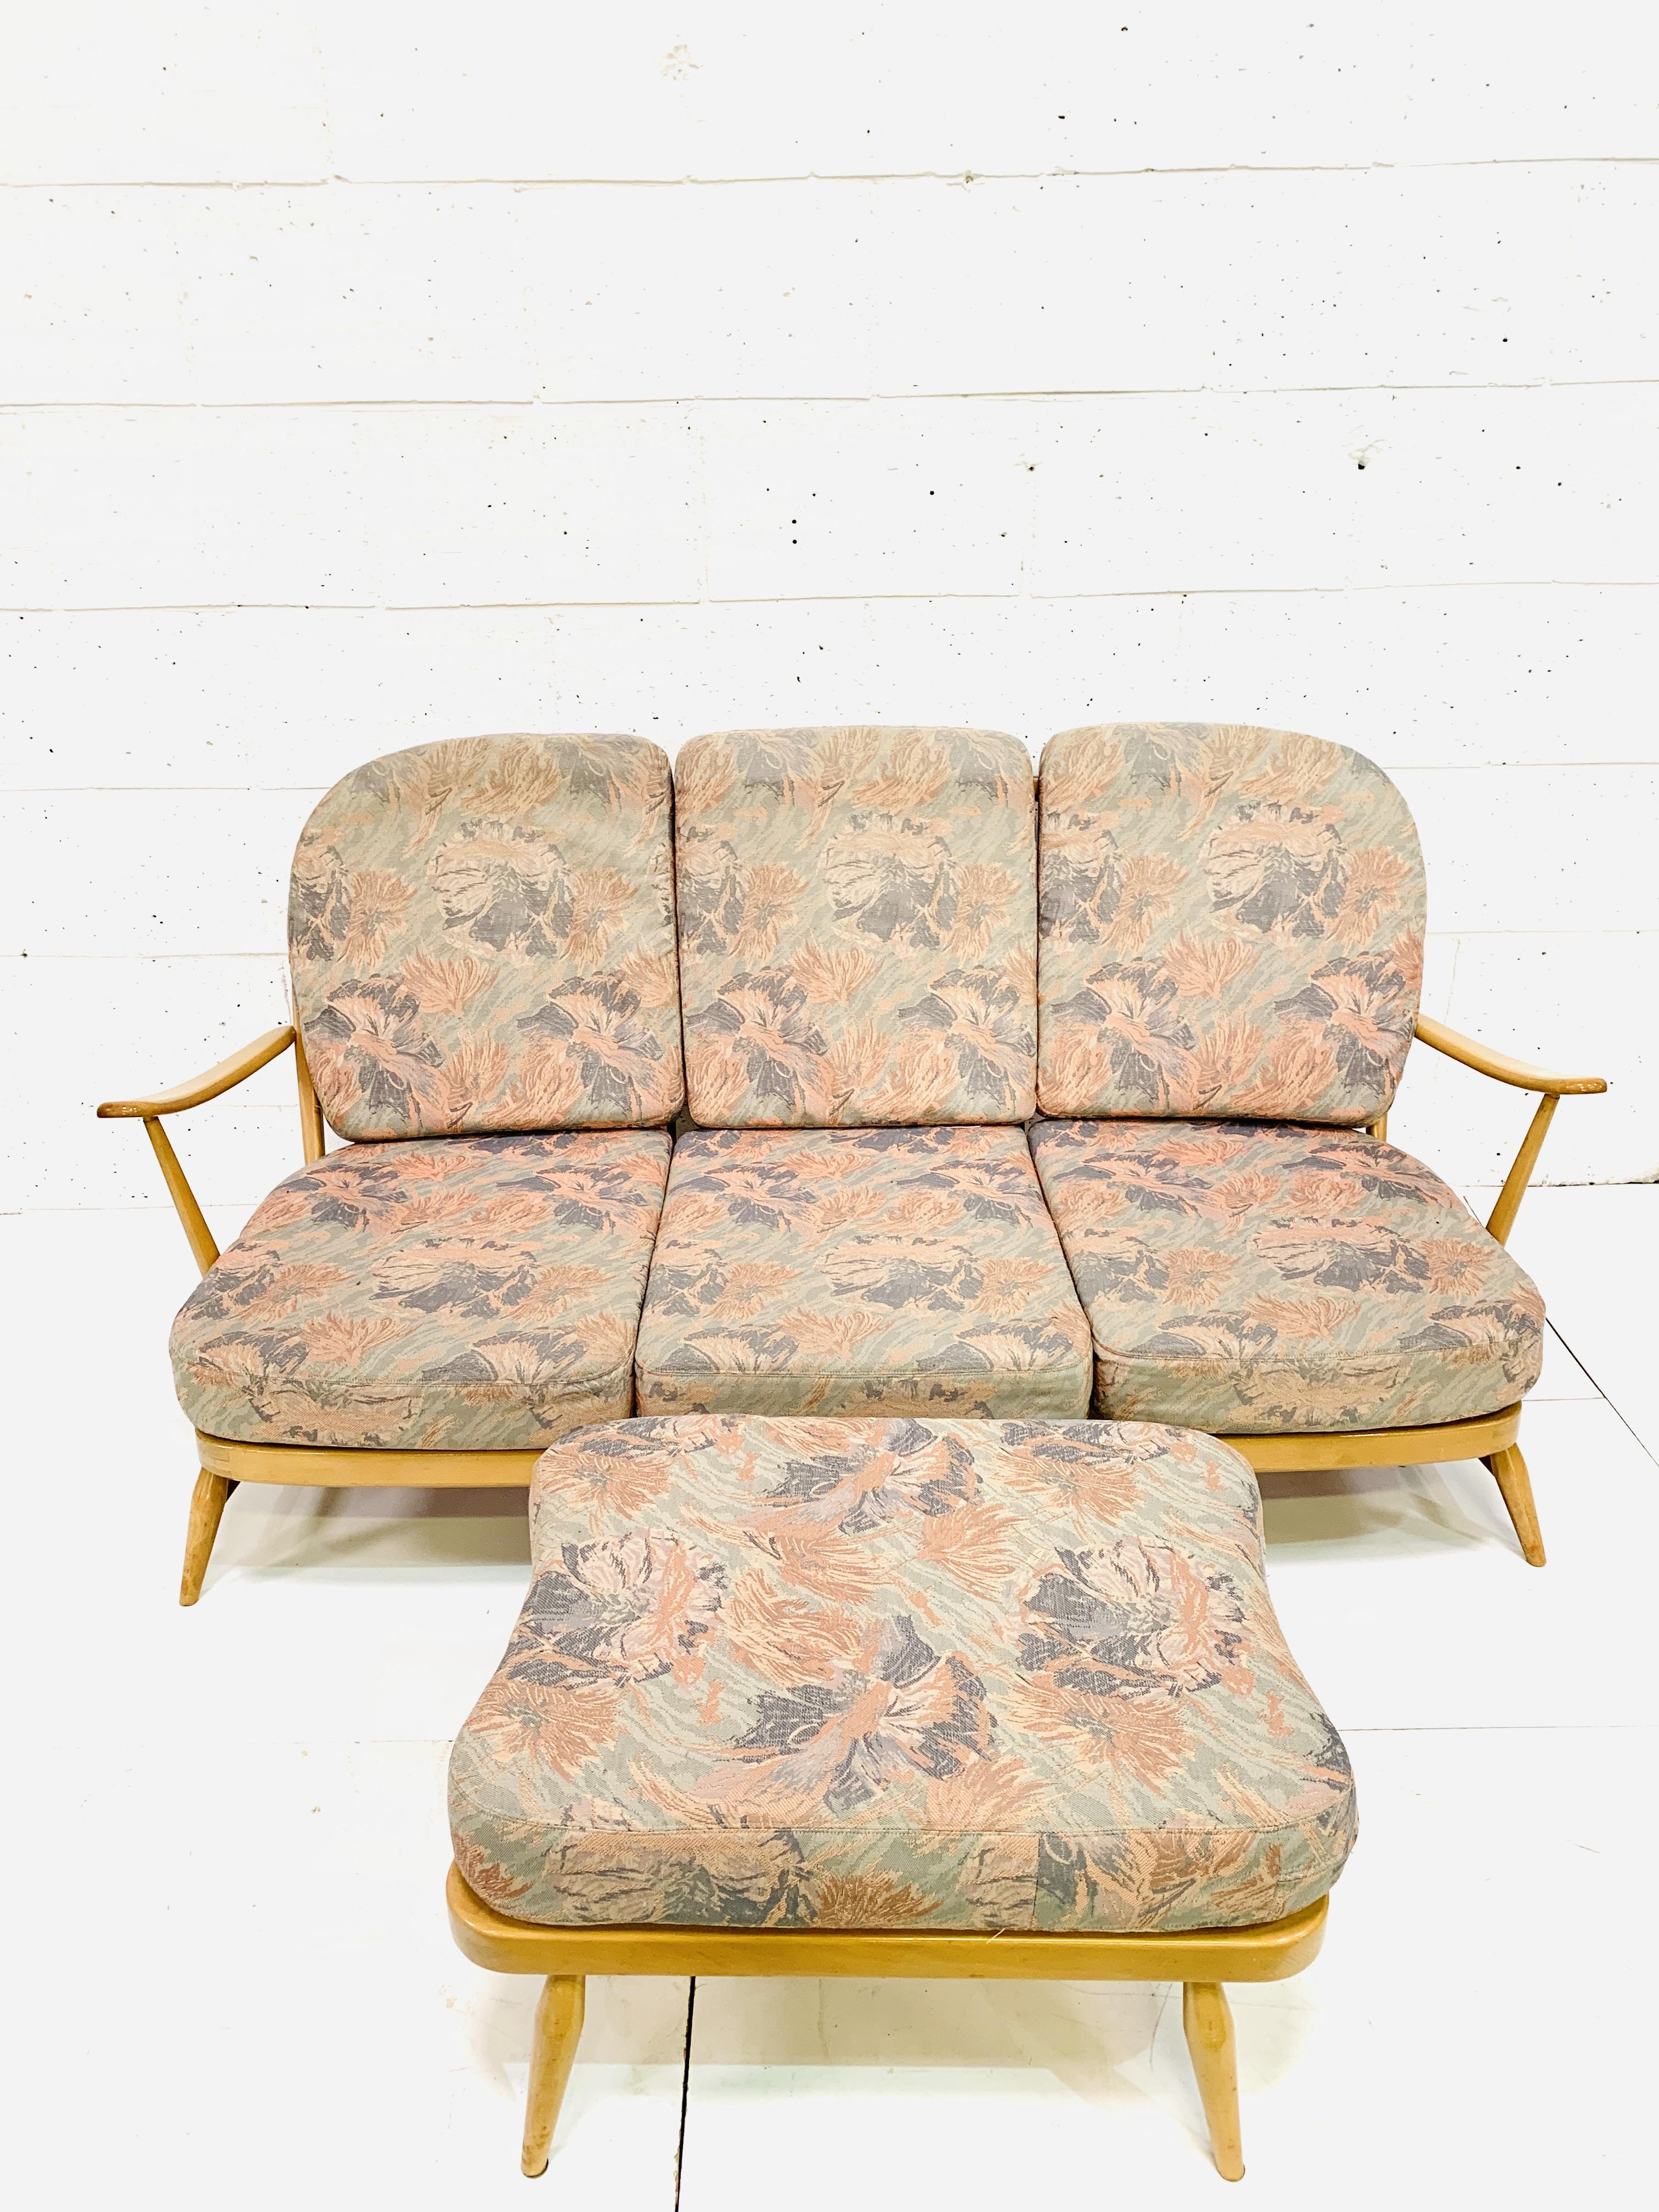 Ercol three seat sofa - Image 2 of 5